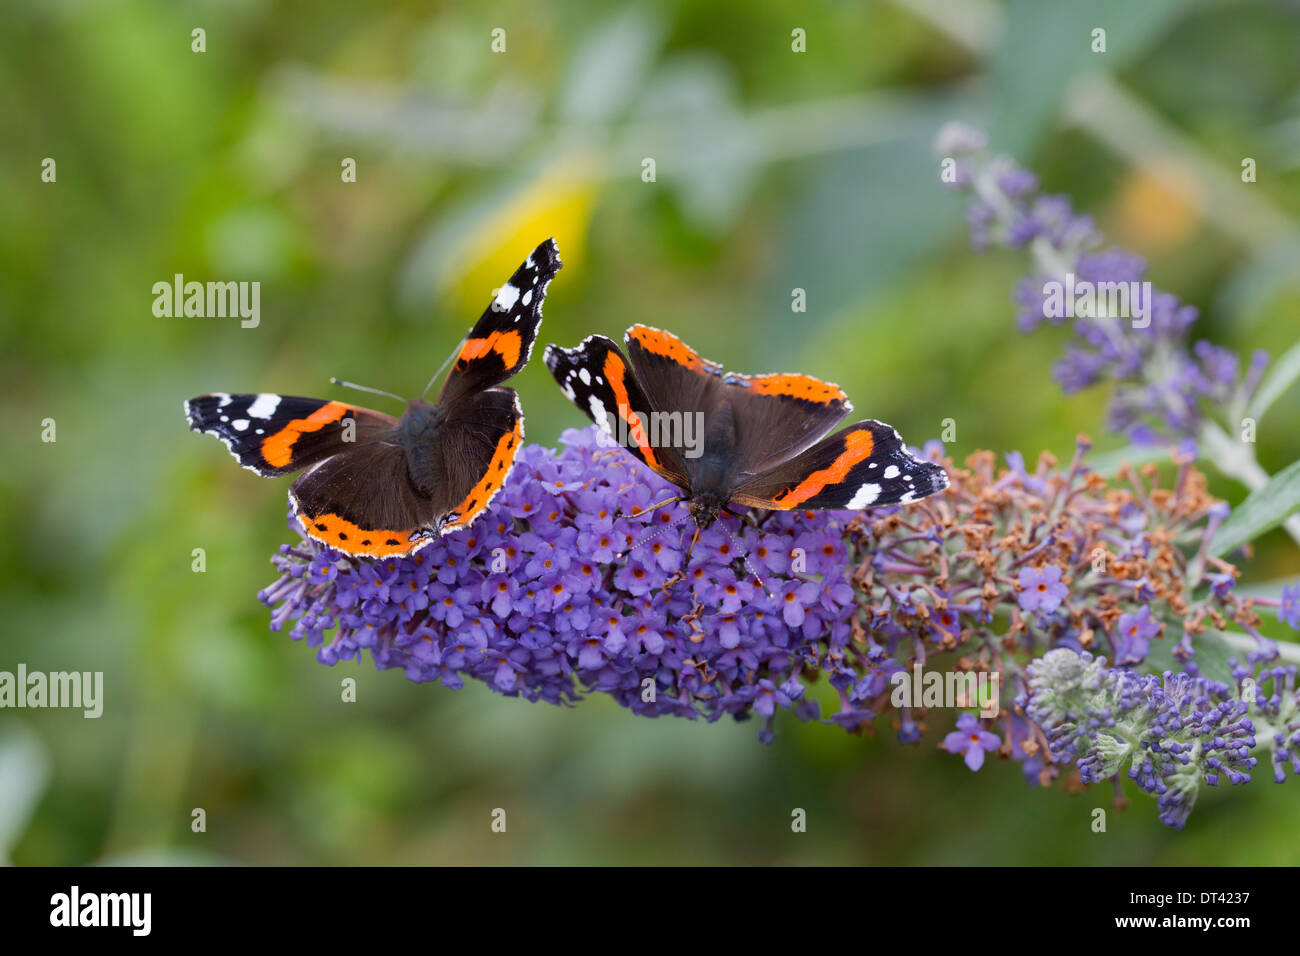 Red Admiral Butterflies; Vanessa atalanta; on Buddleia Flowers; Summer; UK - Stock Image